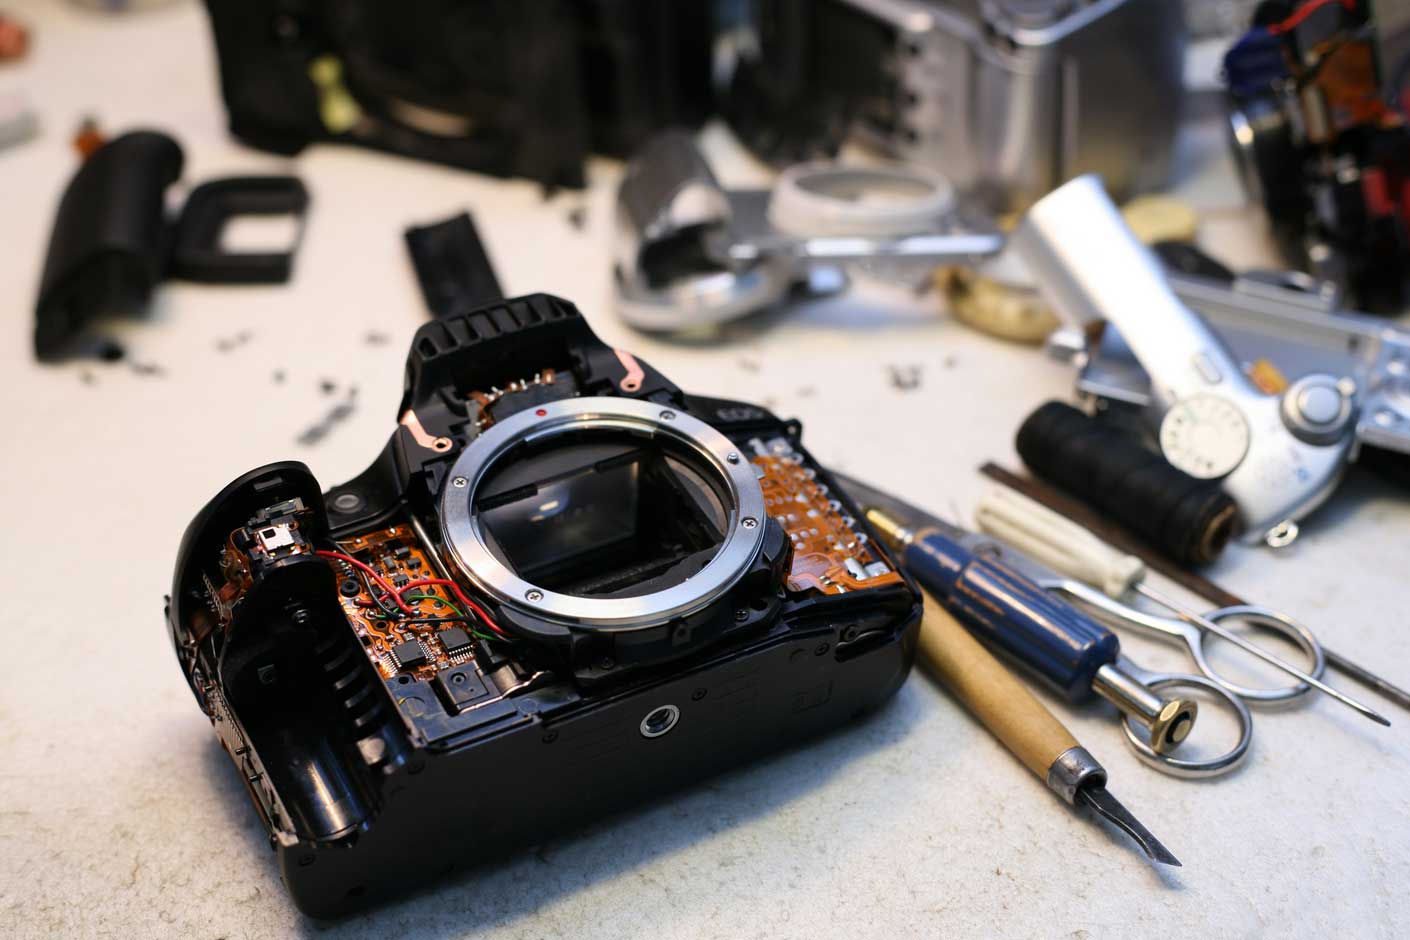 Best camera repair tools